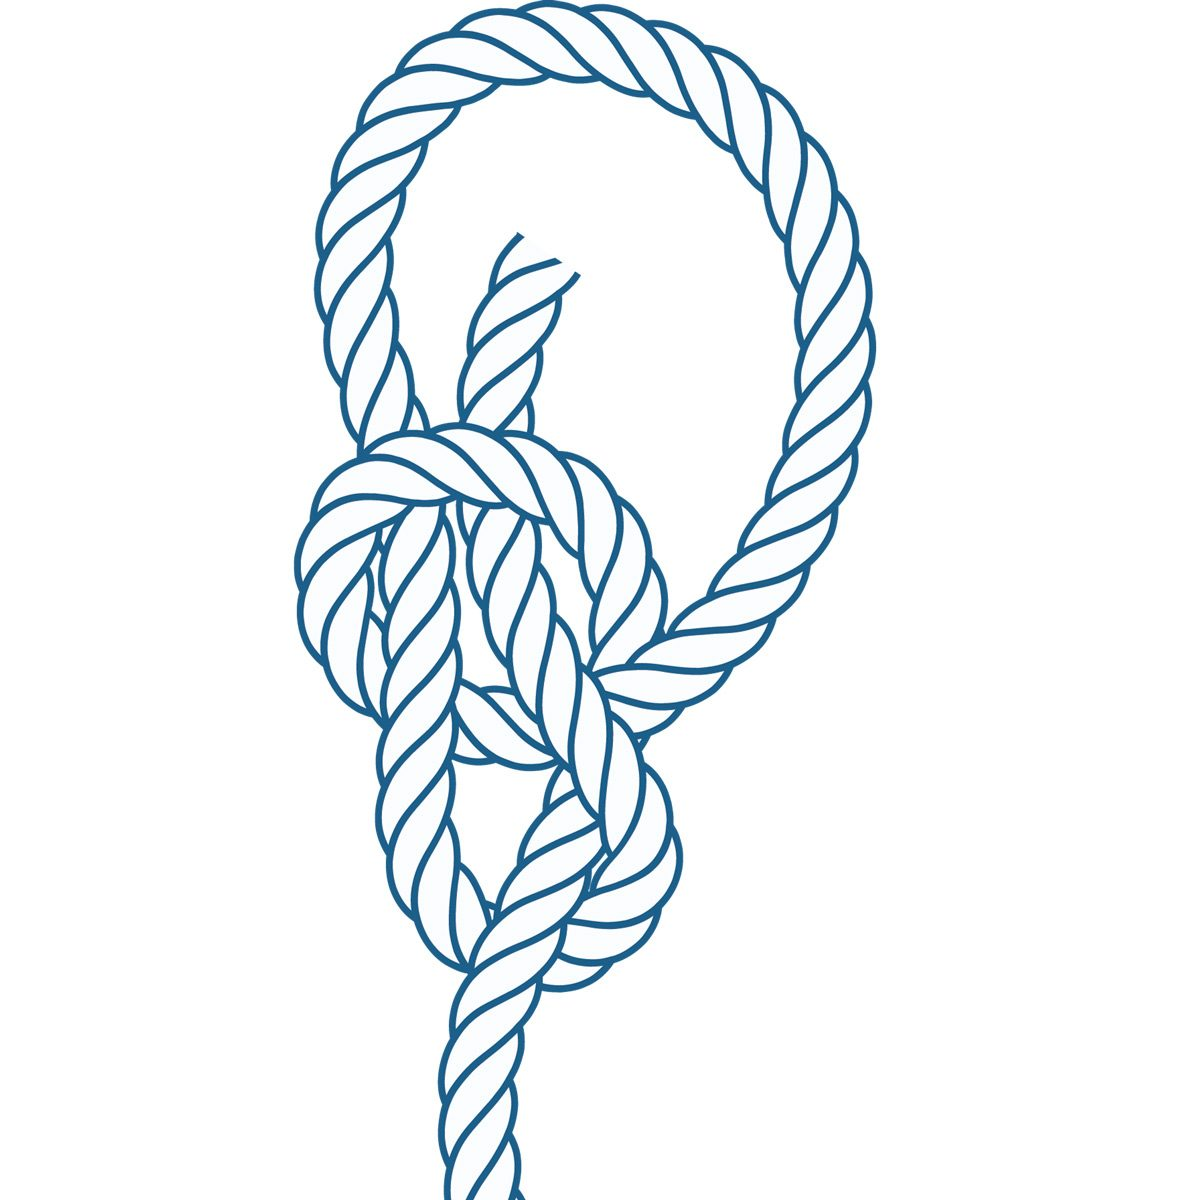 knots-05 bowline knot